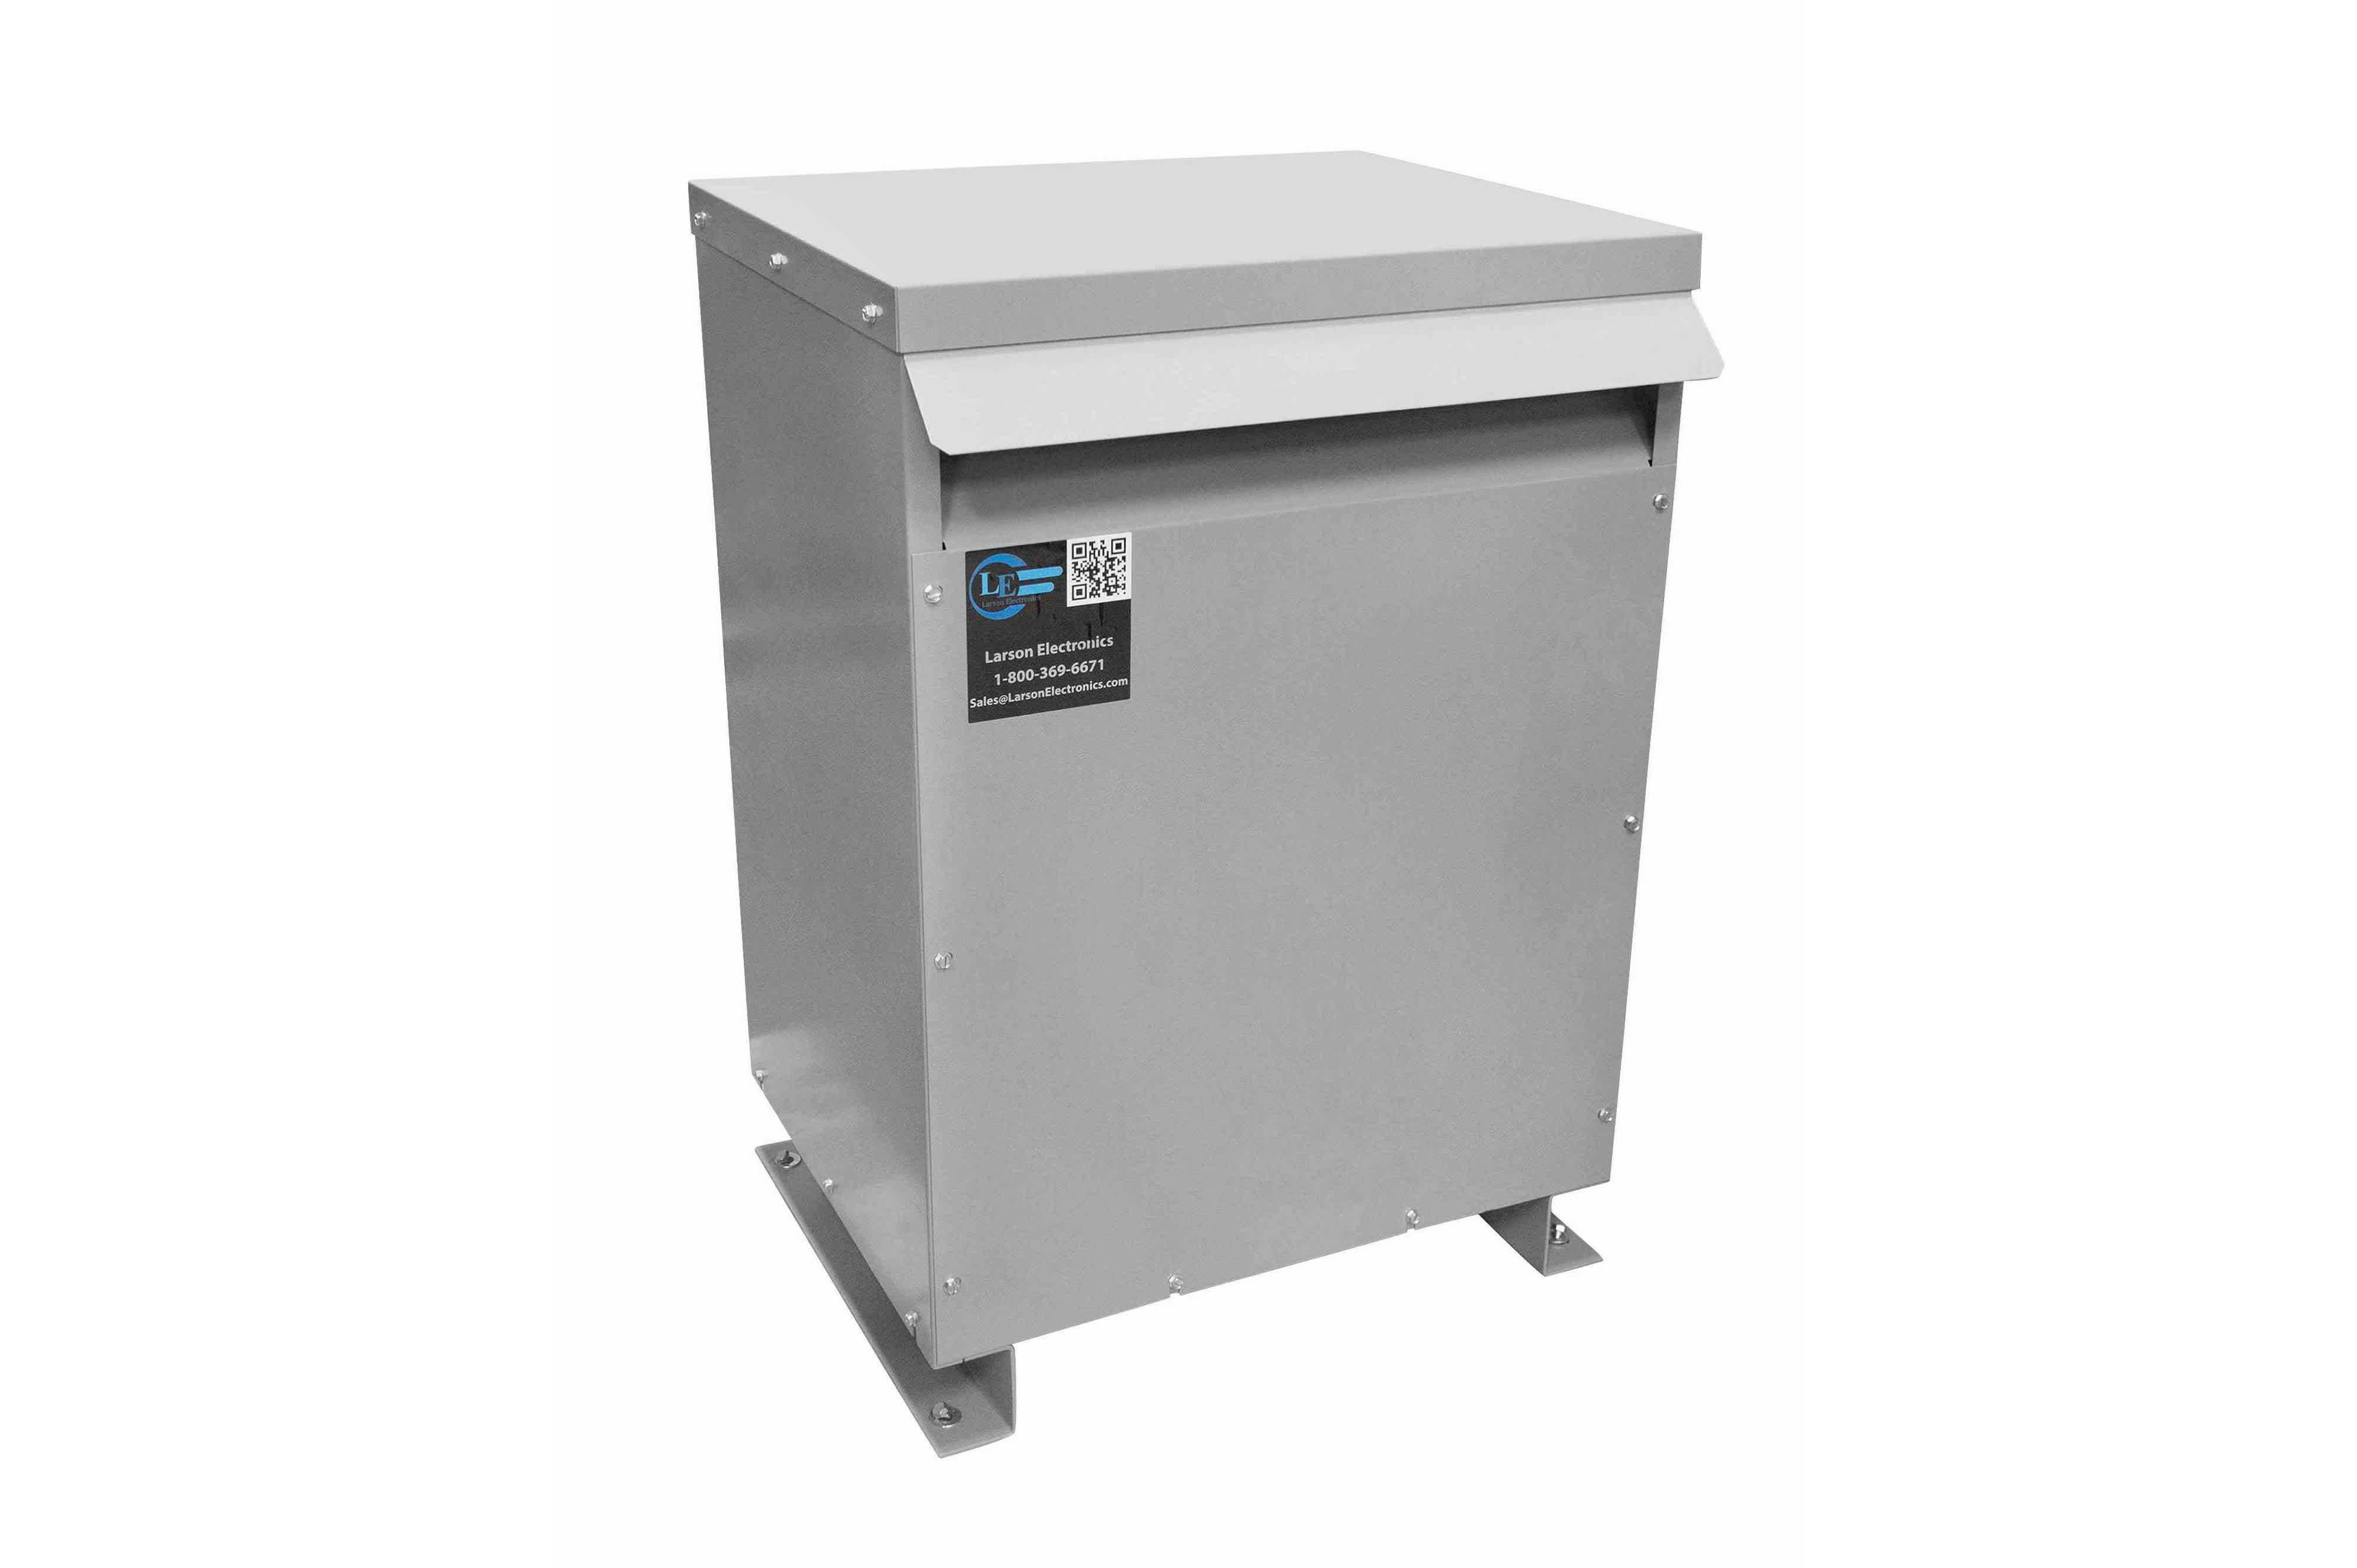 80 kVA 3PH Isolation Transformer, 480V Wye Primary, 575V Delta Secondary, N3R, Ventilated, 60 Hz